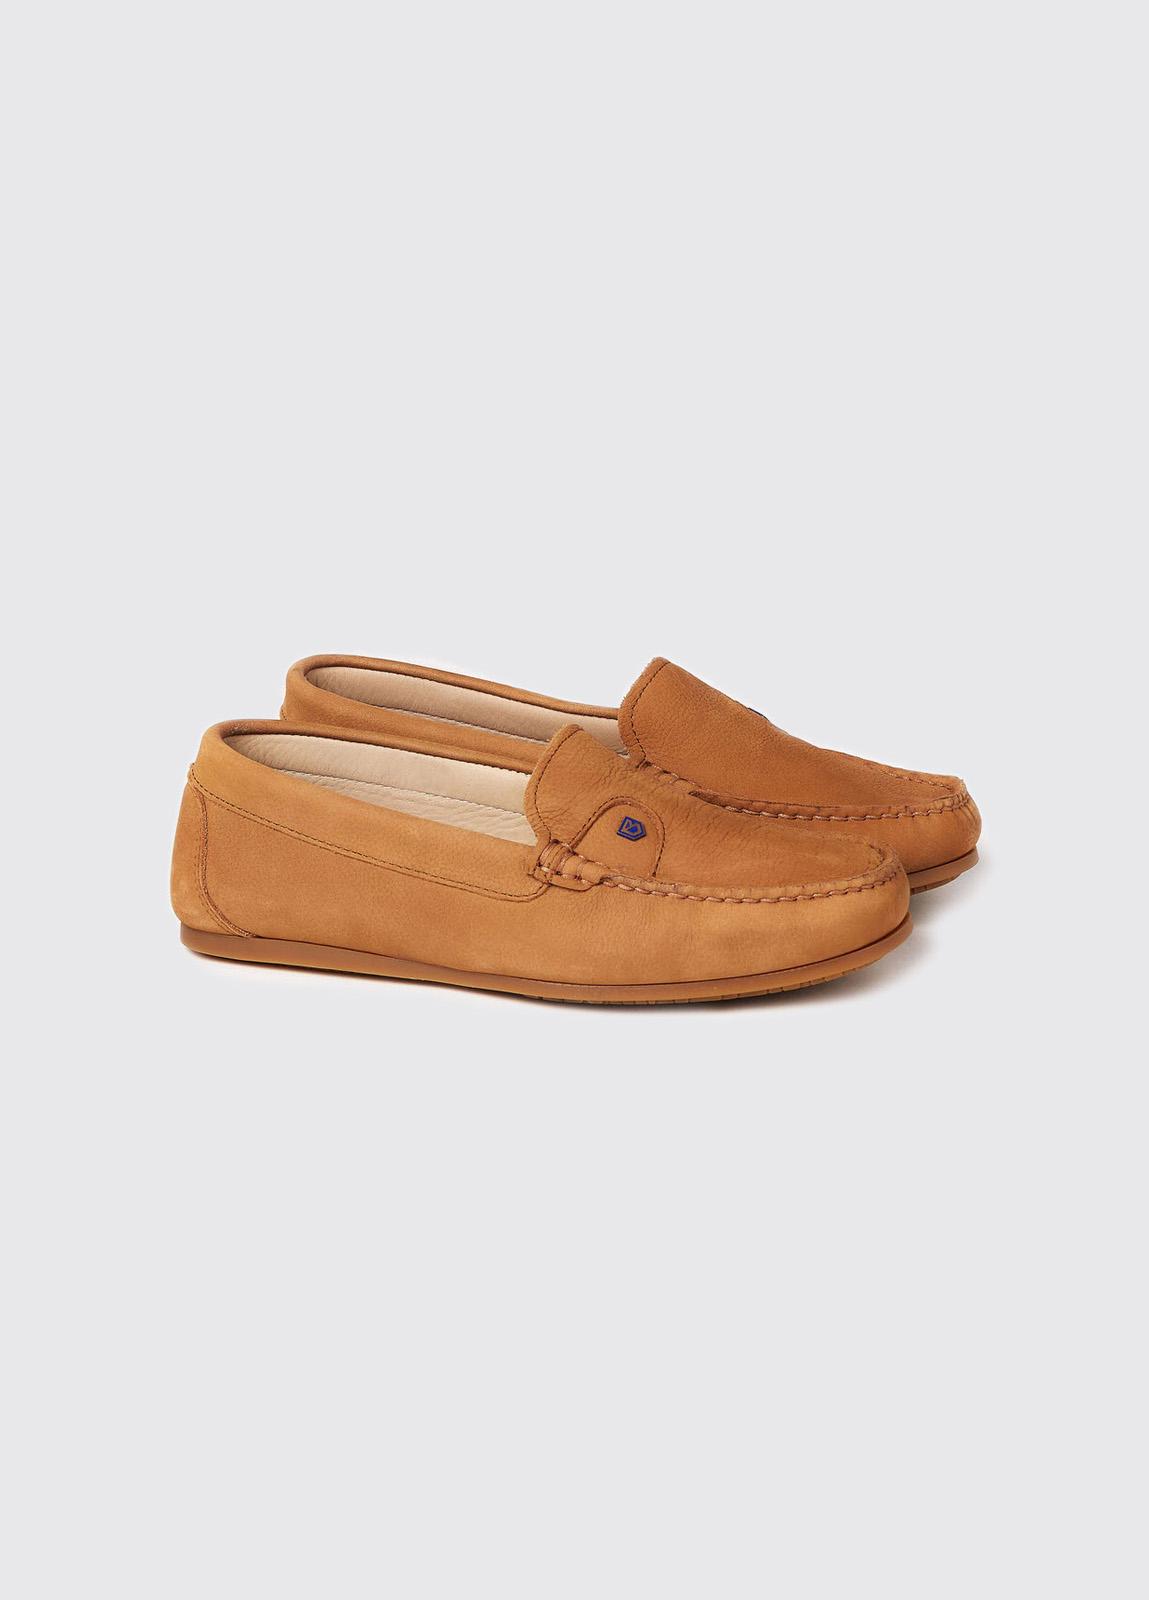 Bali Loafer - Tan